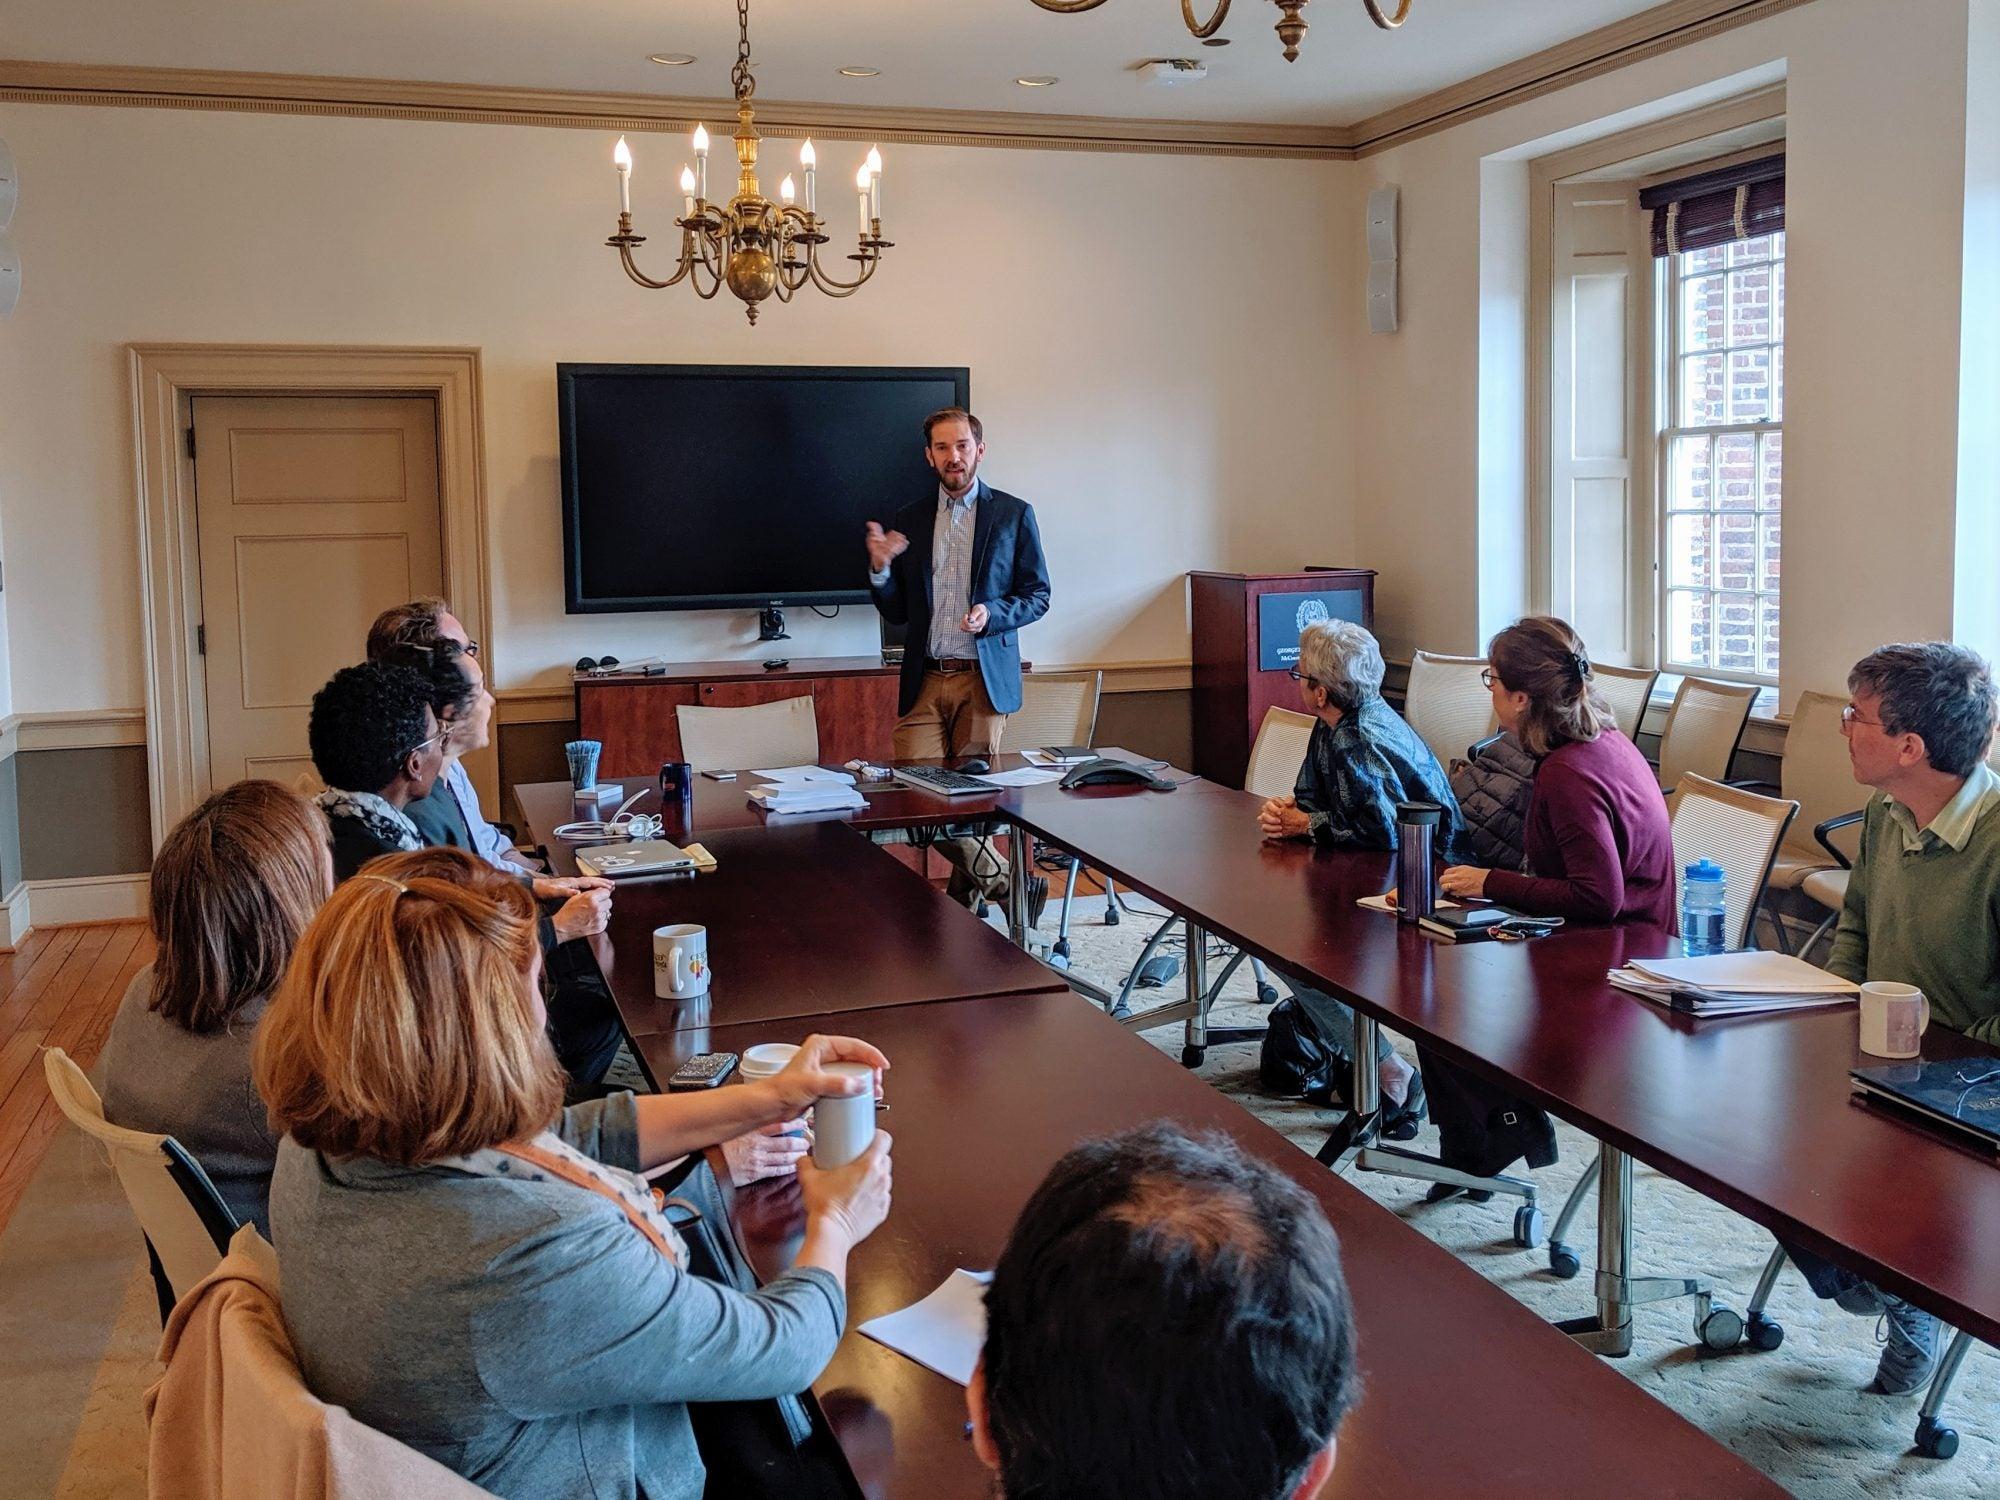 Image of McCourt School Professor Jonathan Ladd giving a presentation during a faculty seminar